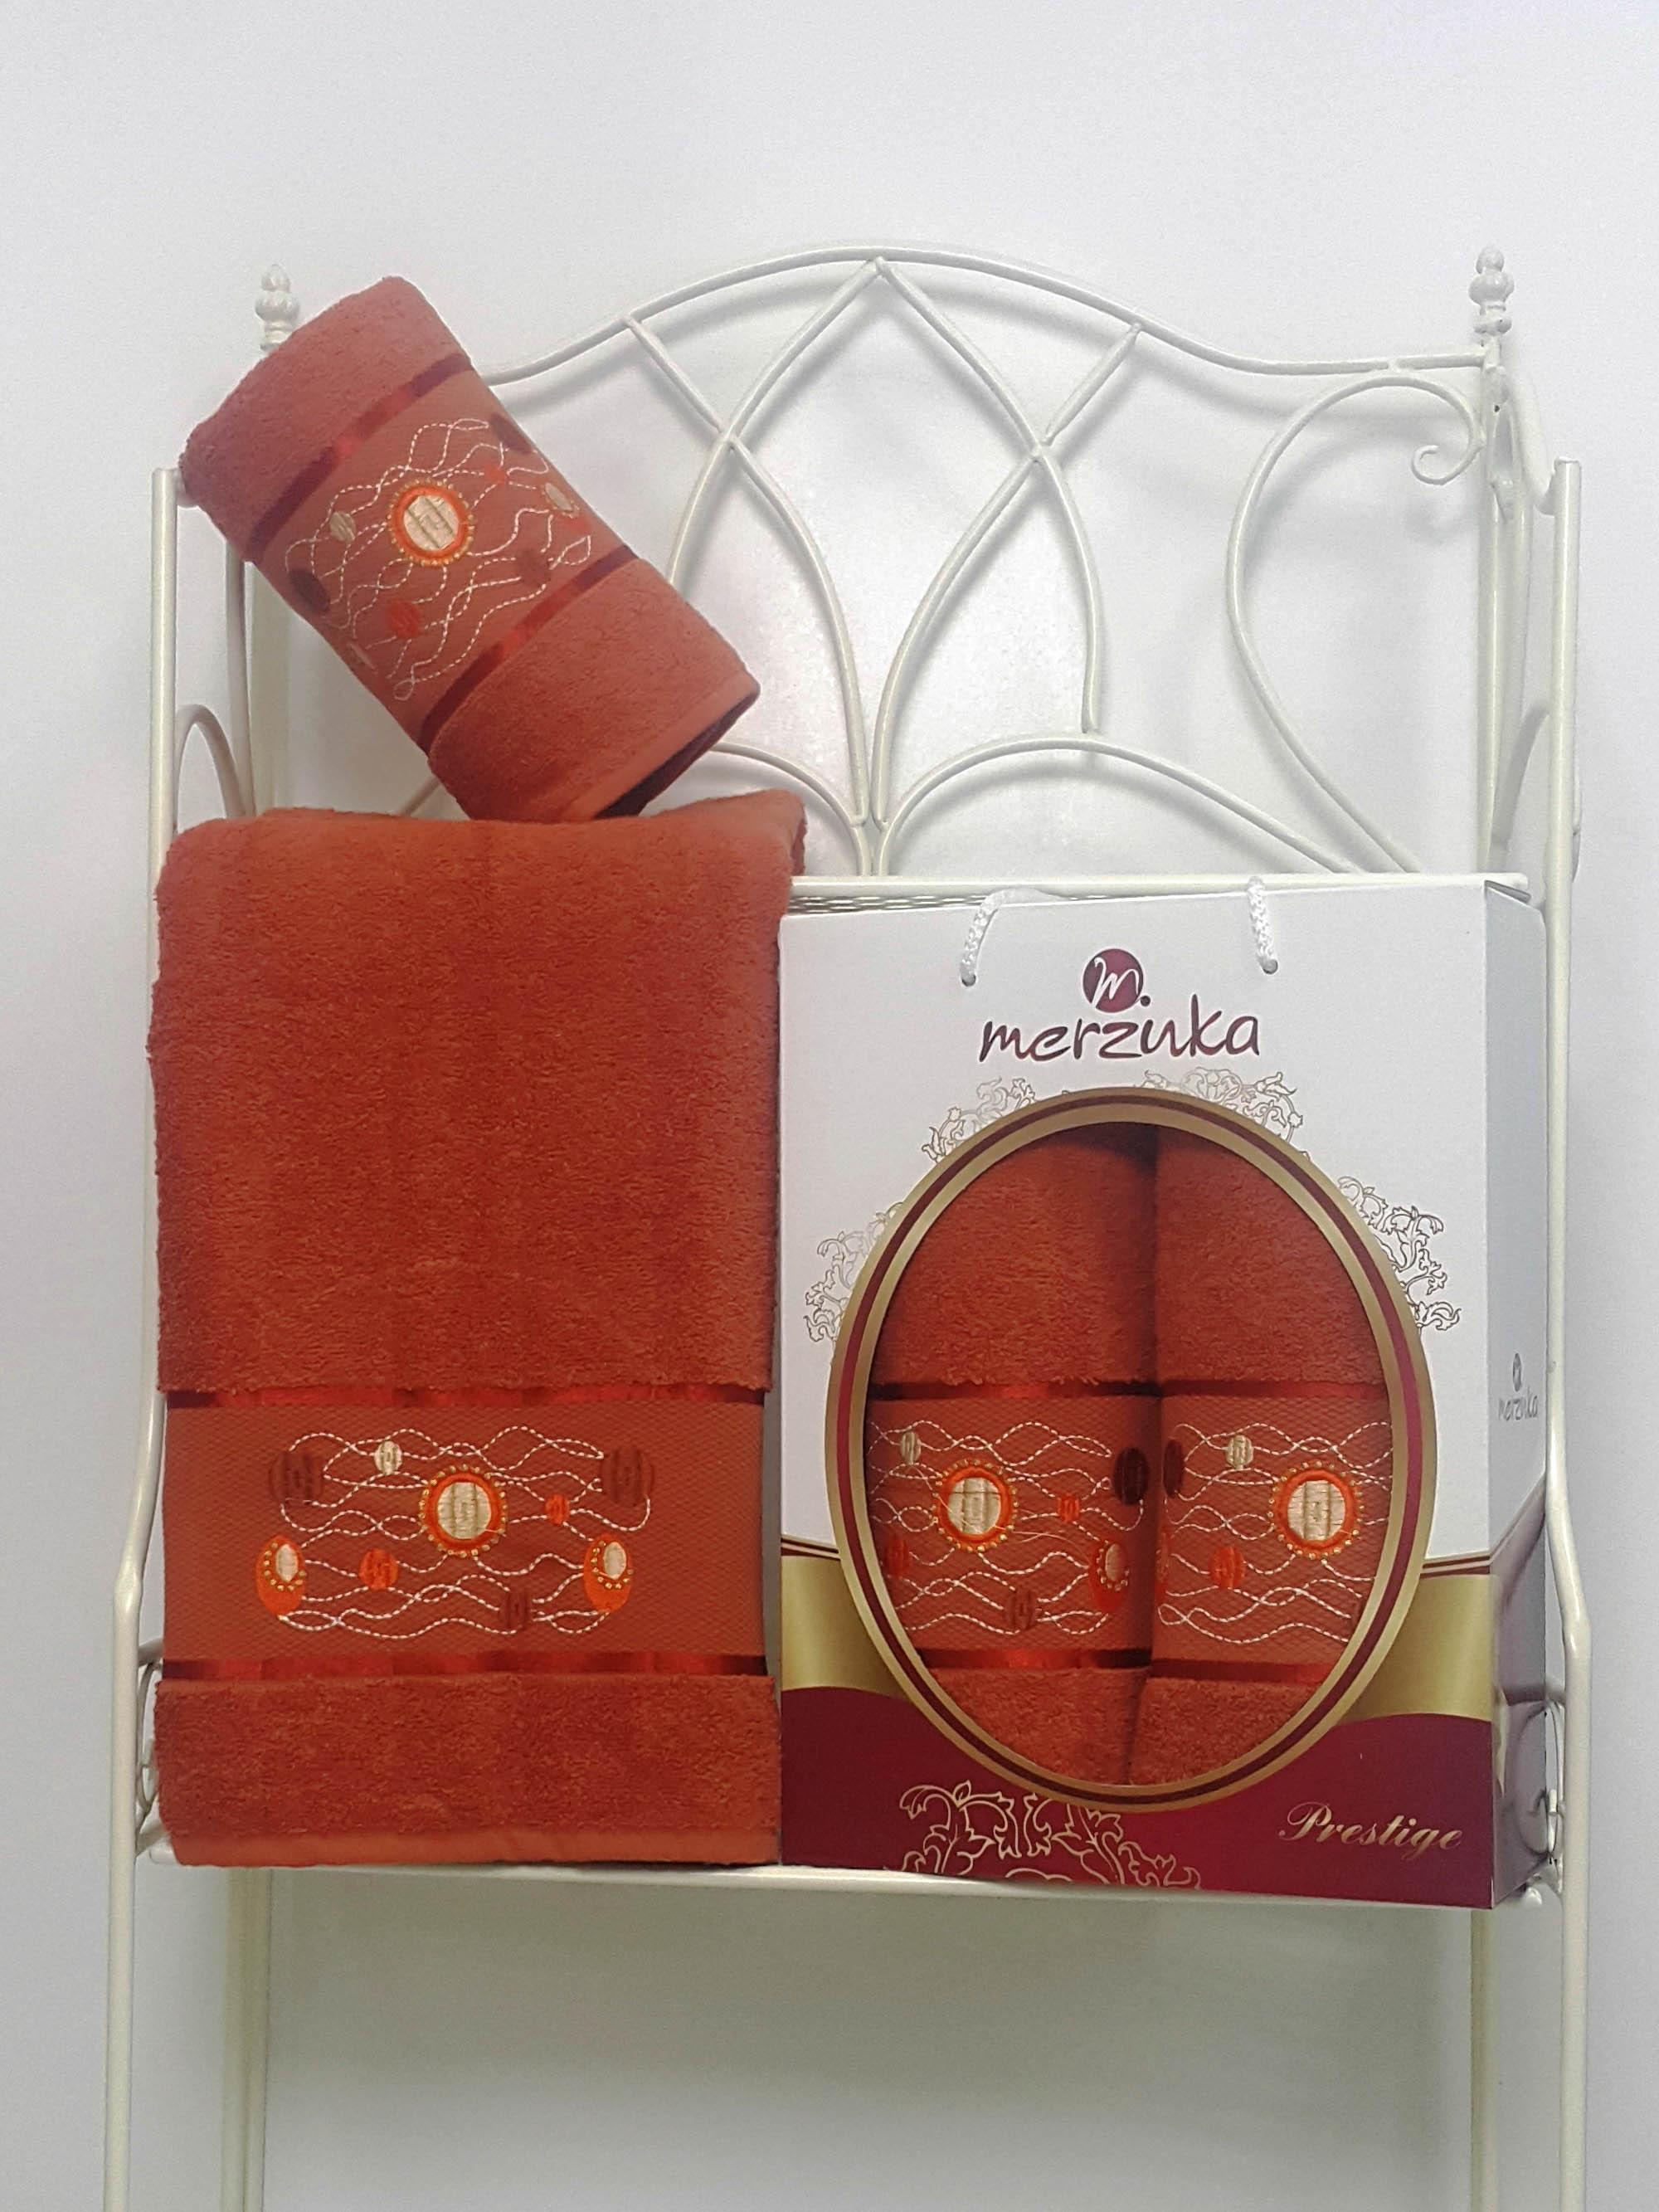 Полотенца Oran Merzuka Набор из 2 полотенец Prestij Цвет: Терракотовый набор из 2 полотенец merzuka sakura 50х90 70х140 8430 кремовый